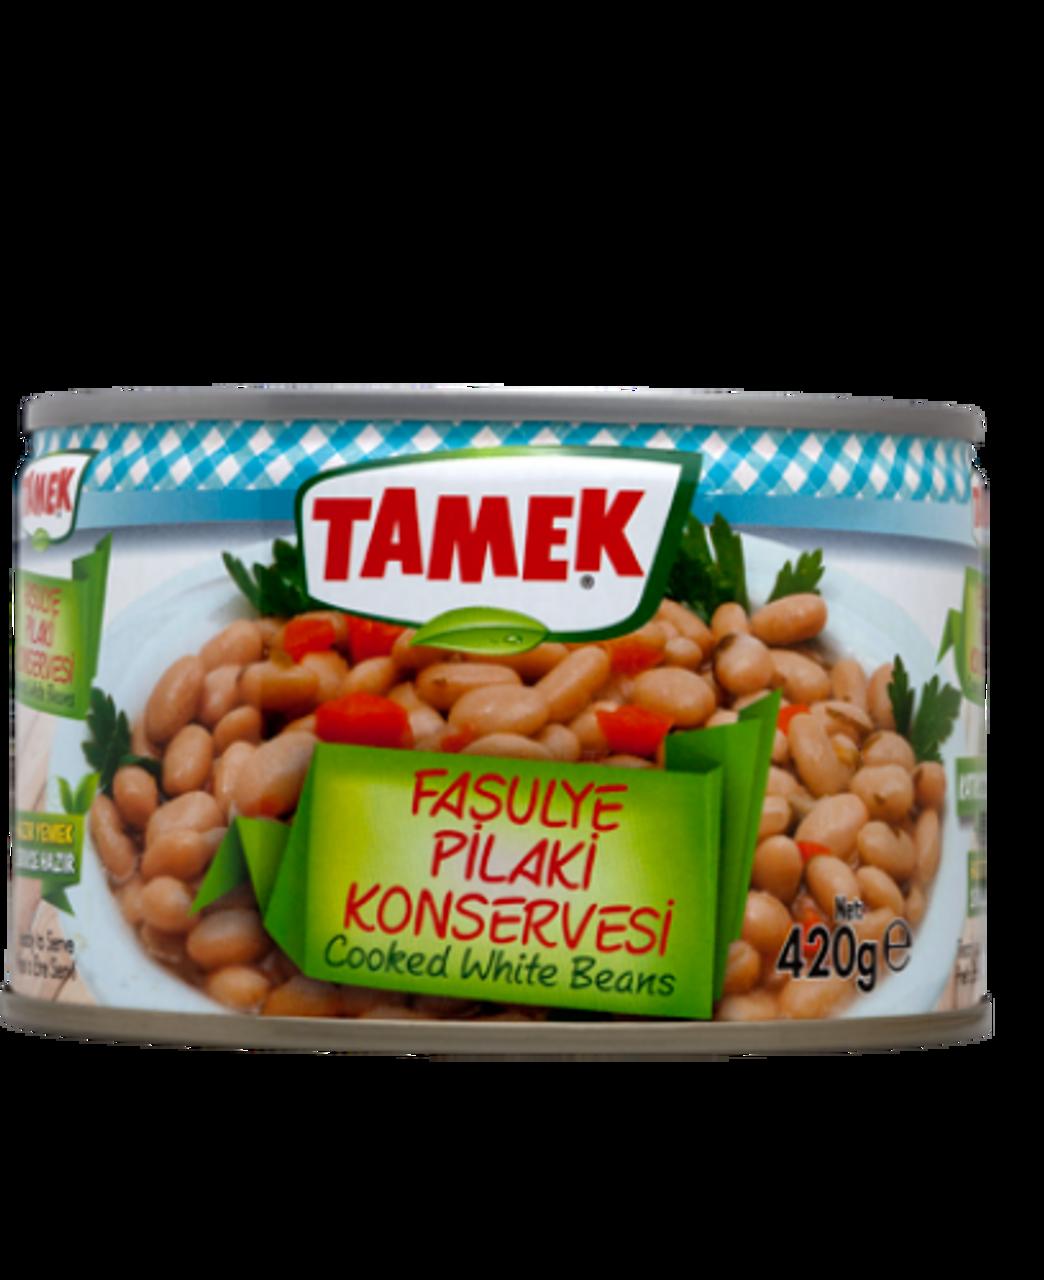 TAMEK Cooked White Beans 420g